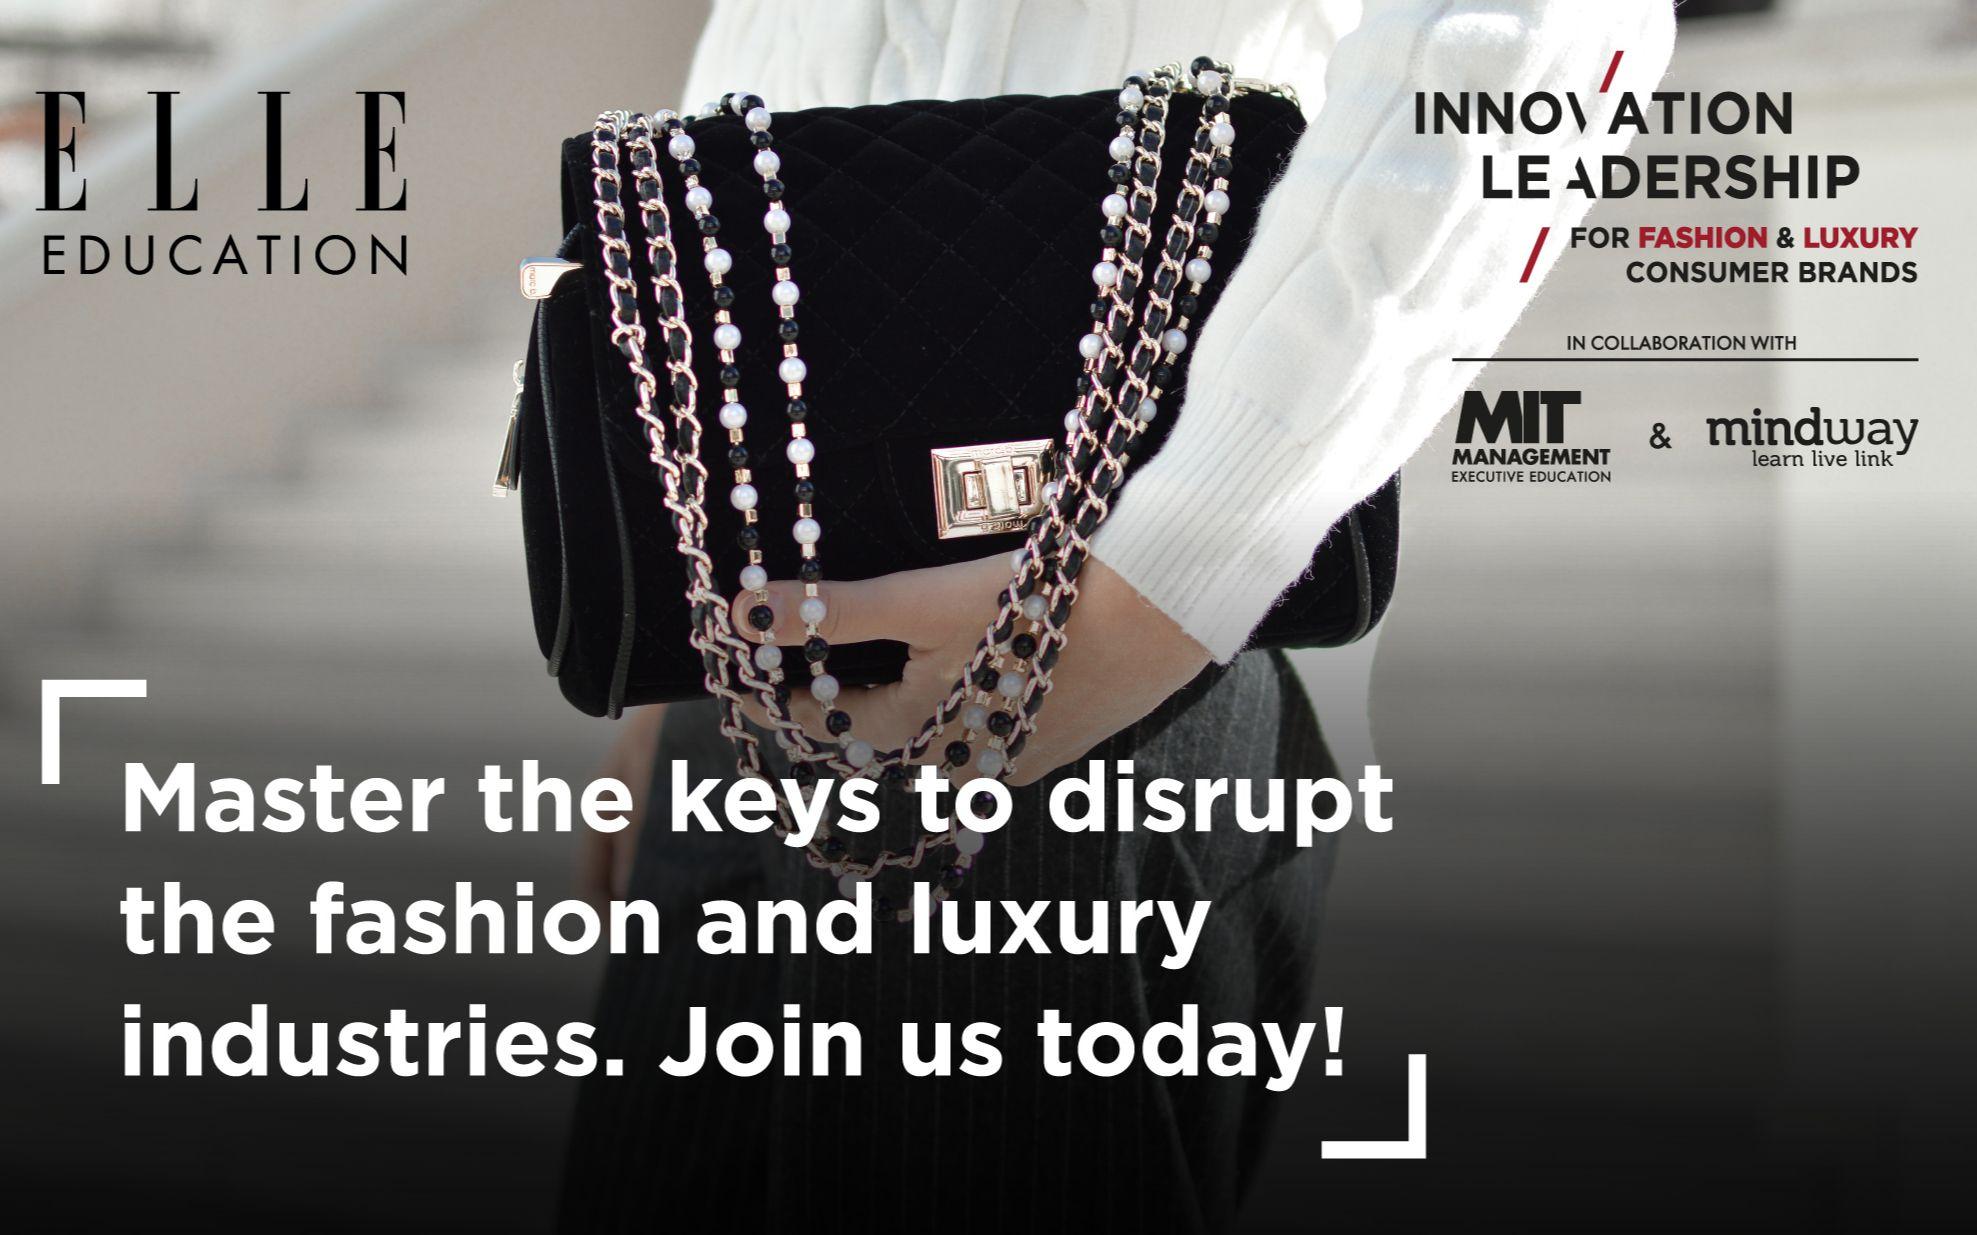 NO.1 패션 미디어 <엘르>와 MIT가 협력한 최고의 패션 프로그램이 찾아옵니다. 세계 최고의 패션 인사이더들에게 배울 수 있는 꿈 같은 기회, 놓치지 마세요!